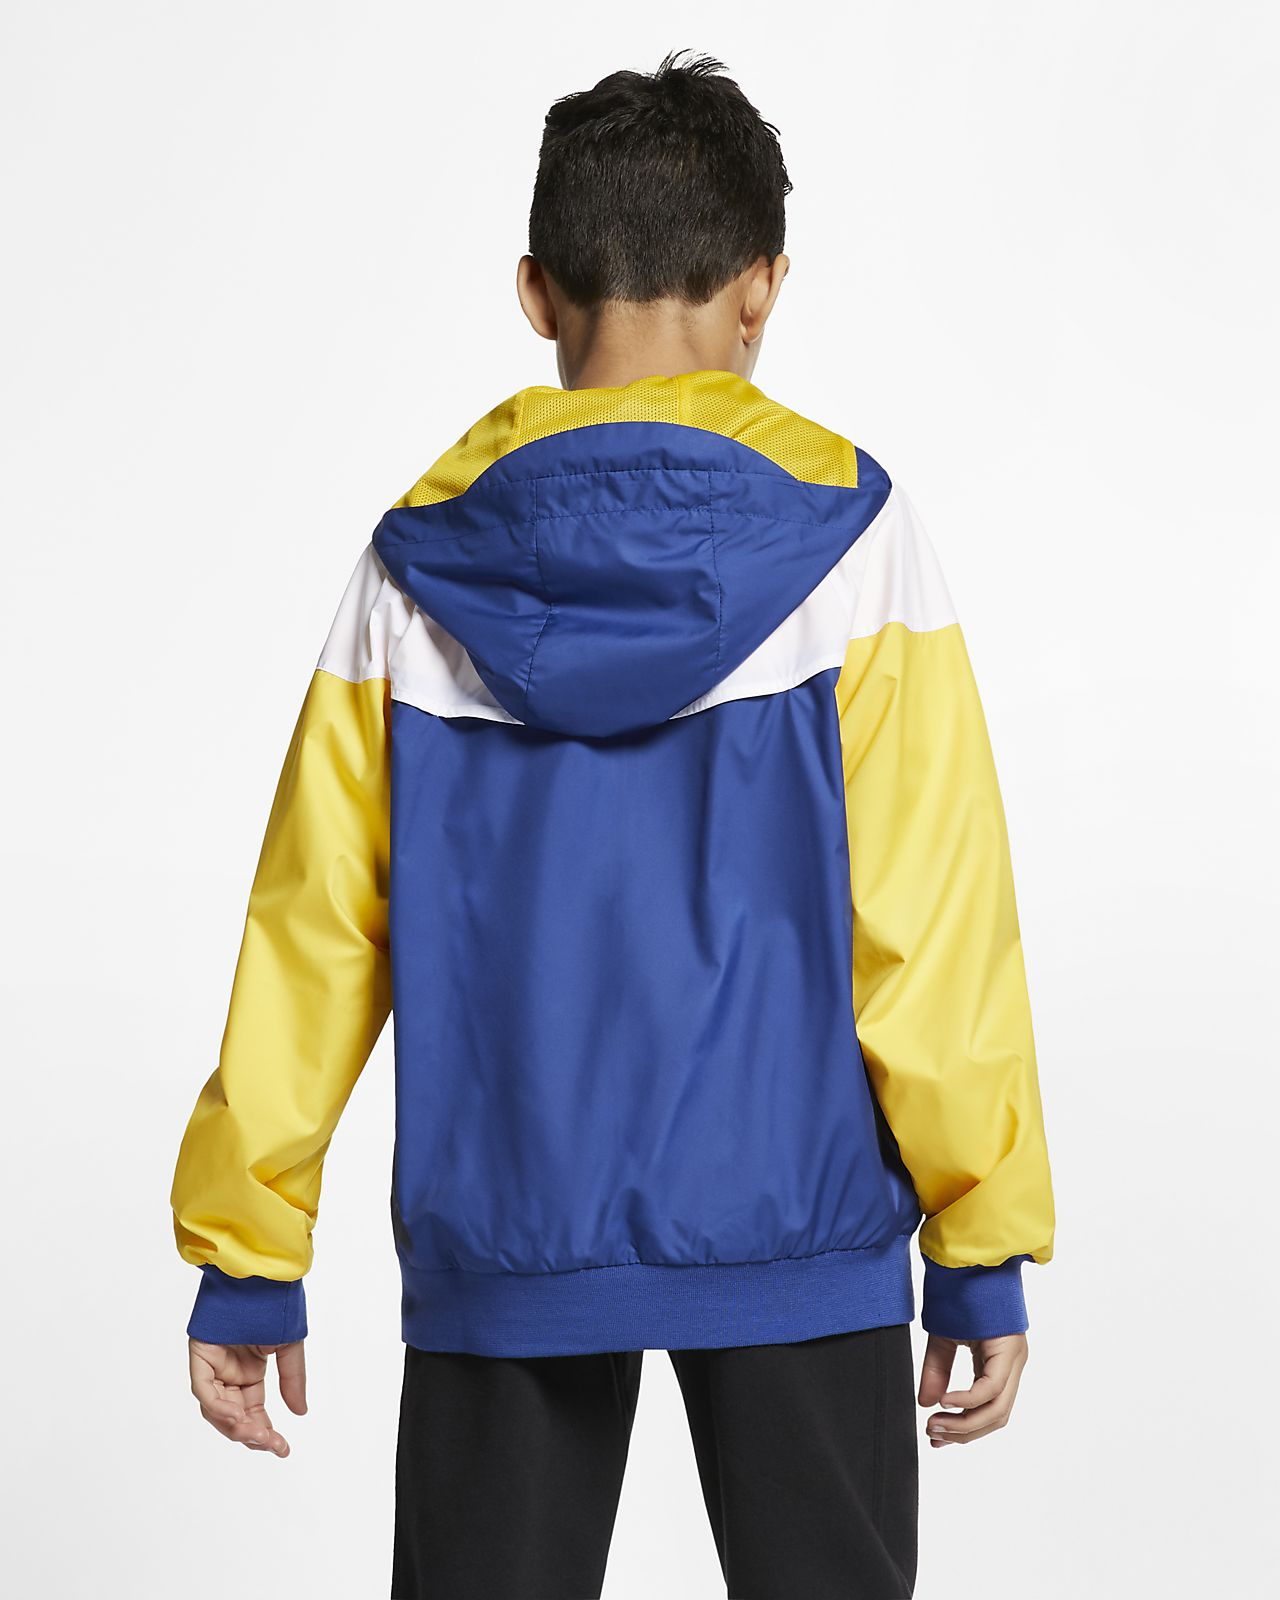 37700a00e Nike Sportswear Windrunner Big Kids  (Boys ) Jacket. Nike.com